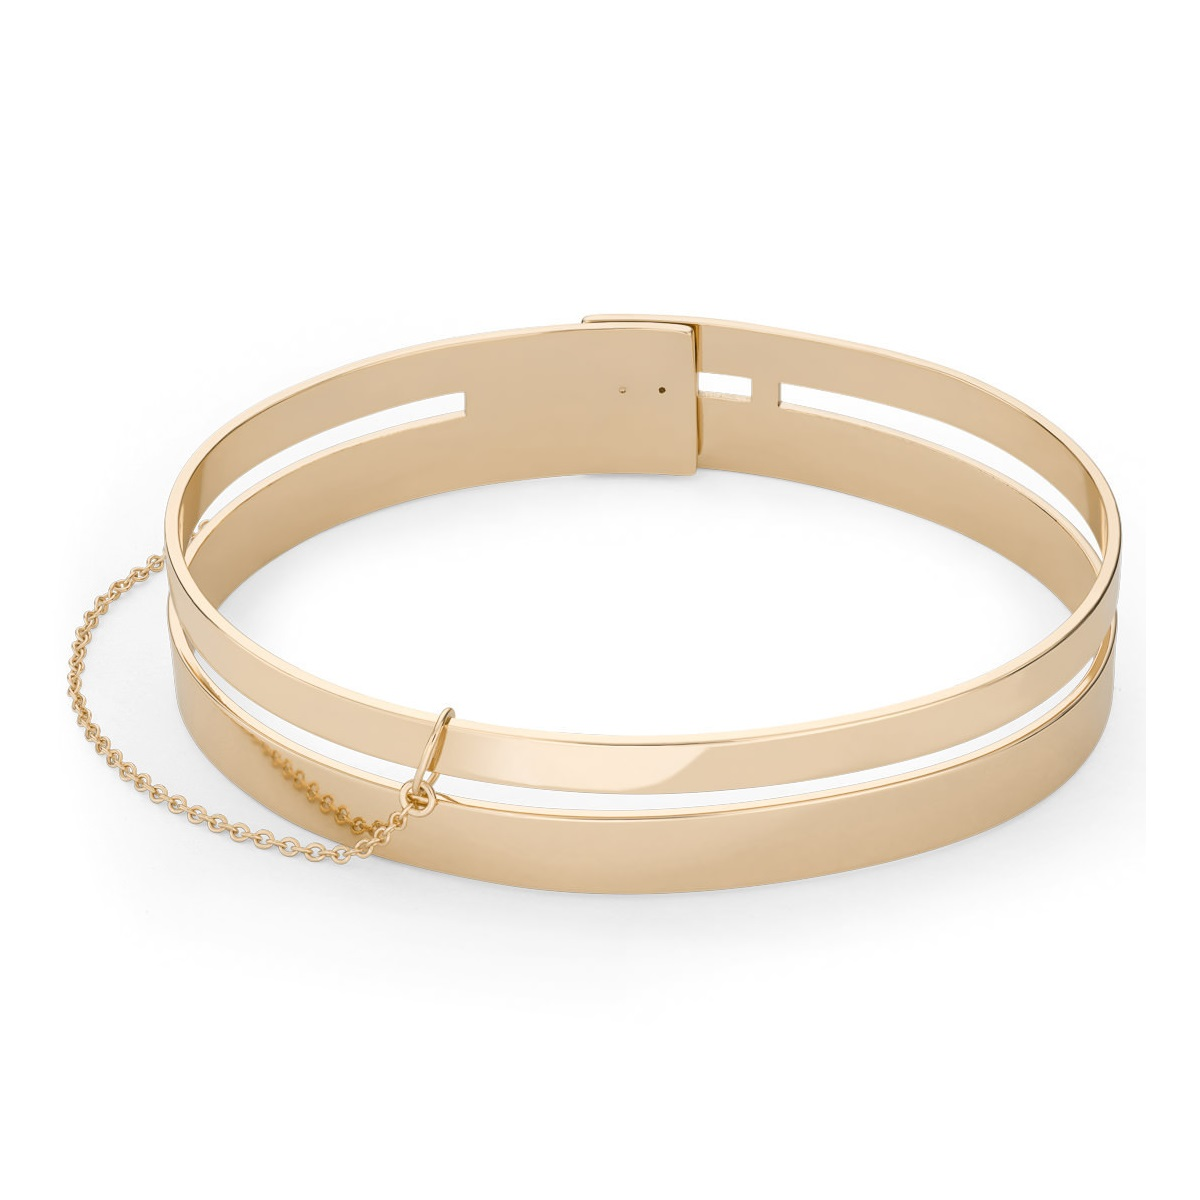 Rosefield Armband Double Bar Bangle Gold